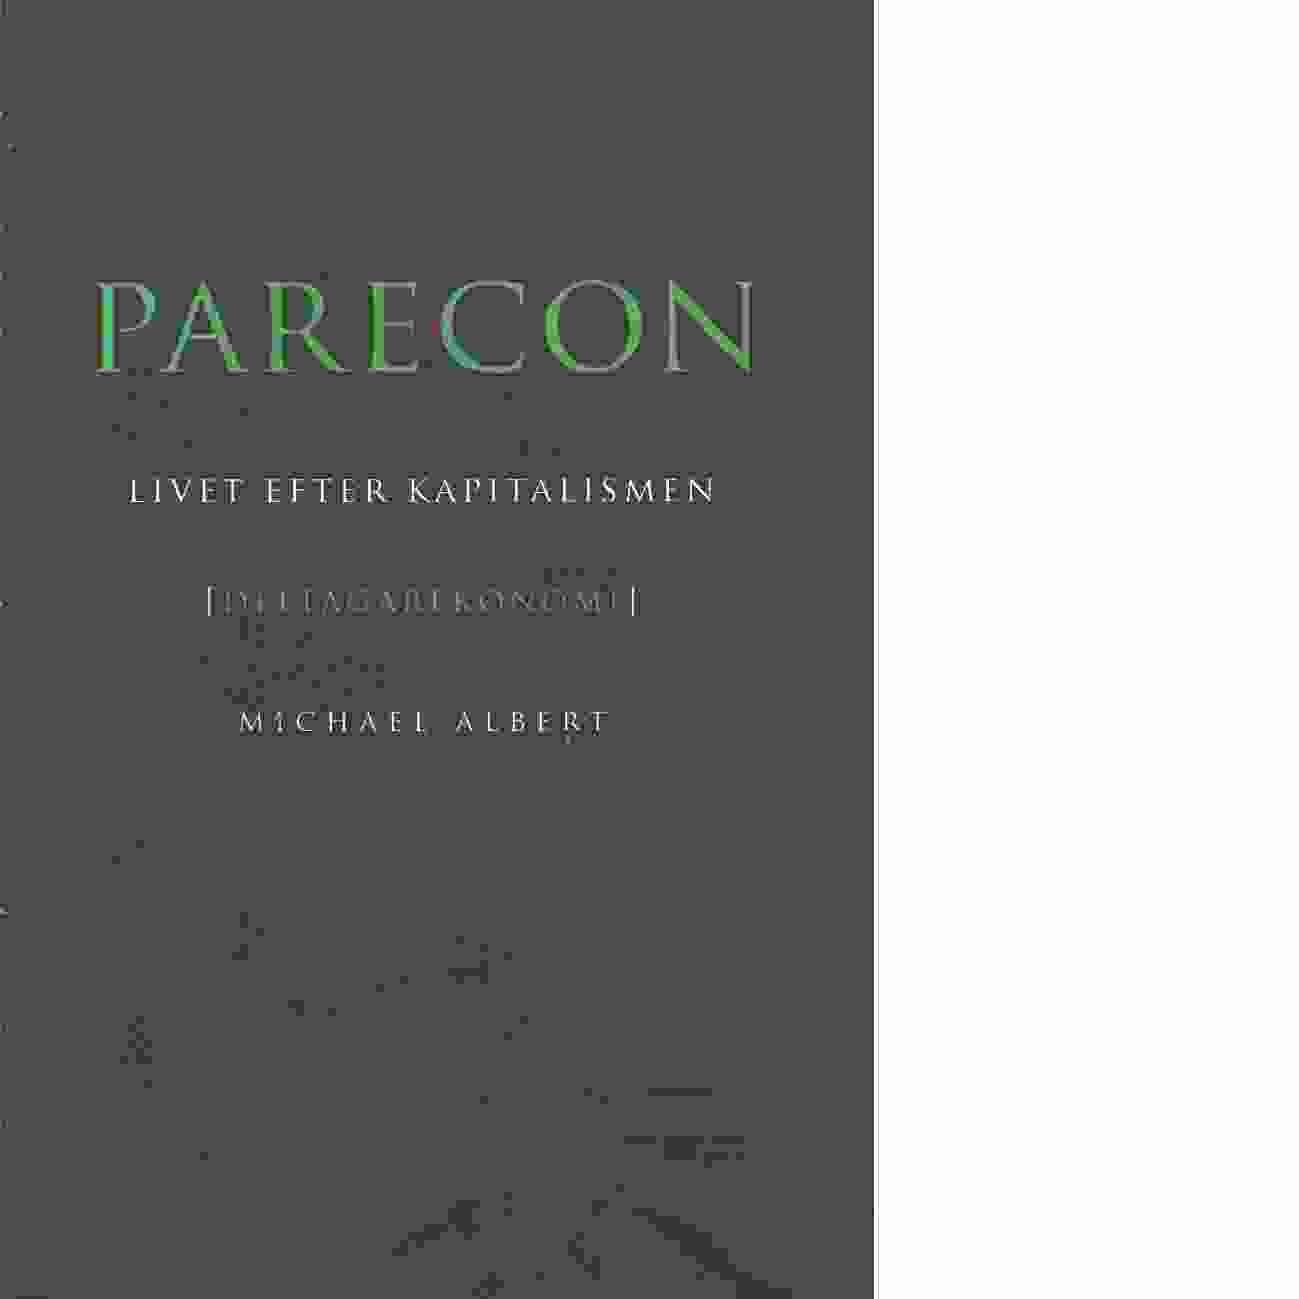 Parecon : livet efter kapitalismen - Albert, Michael